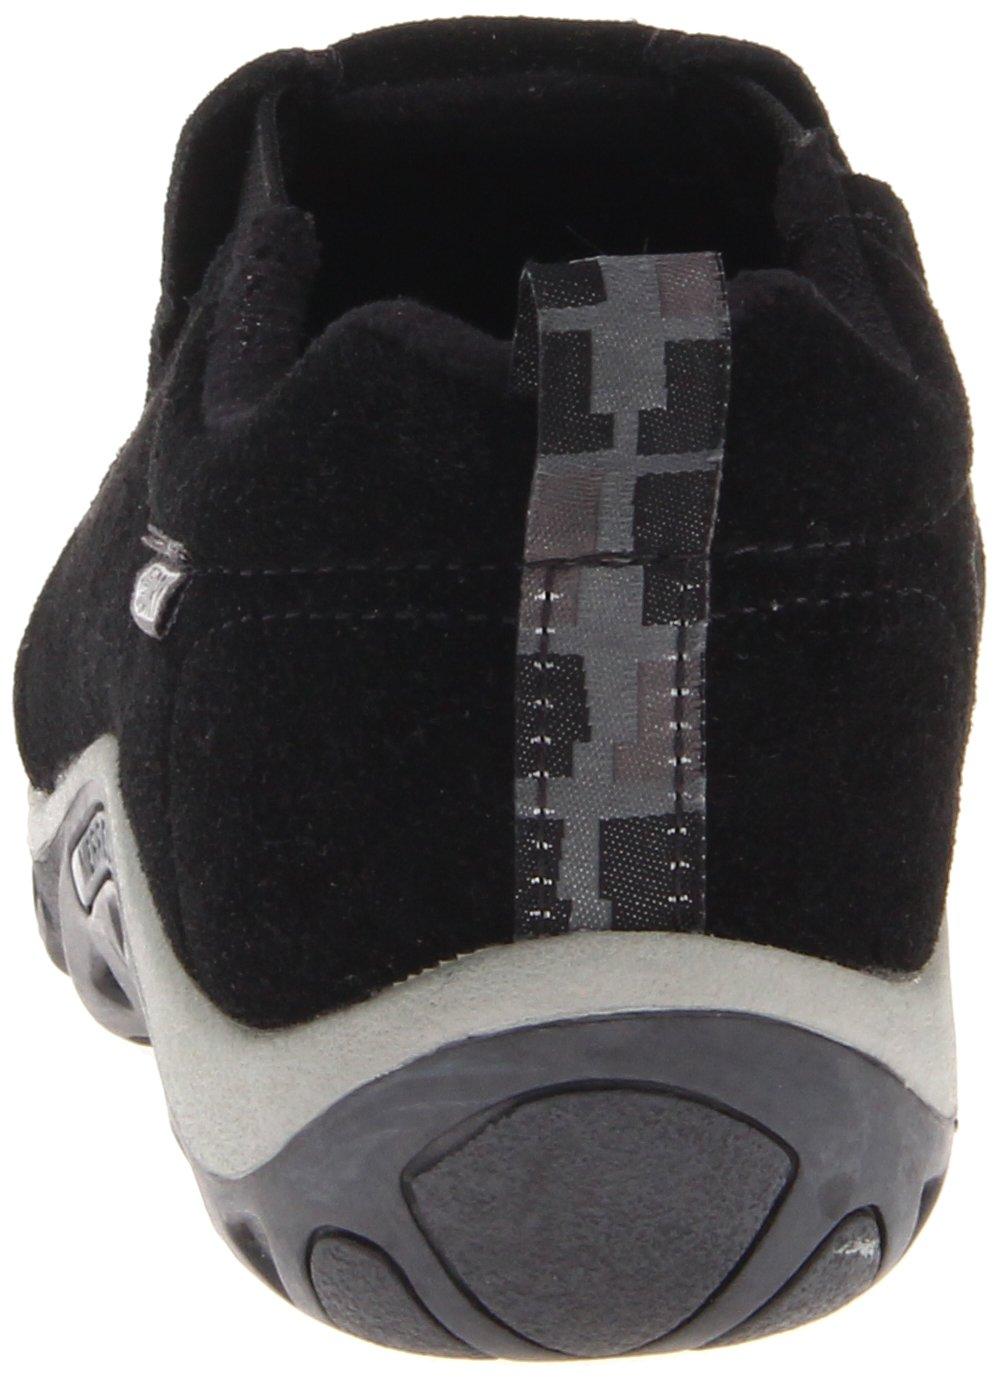 Merrell Jungle Moc Frosty Waterproof Slip-On Shoe (Toddler/Little Kid/Big Kid),Black,7 M US Big Kid by Merrell (Image #2)